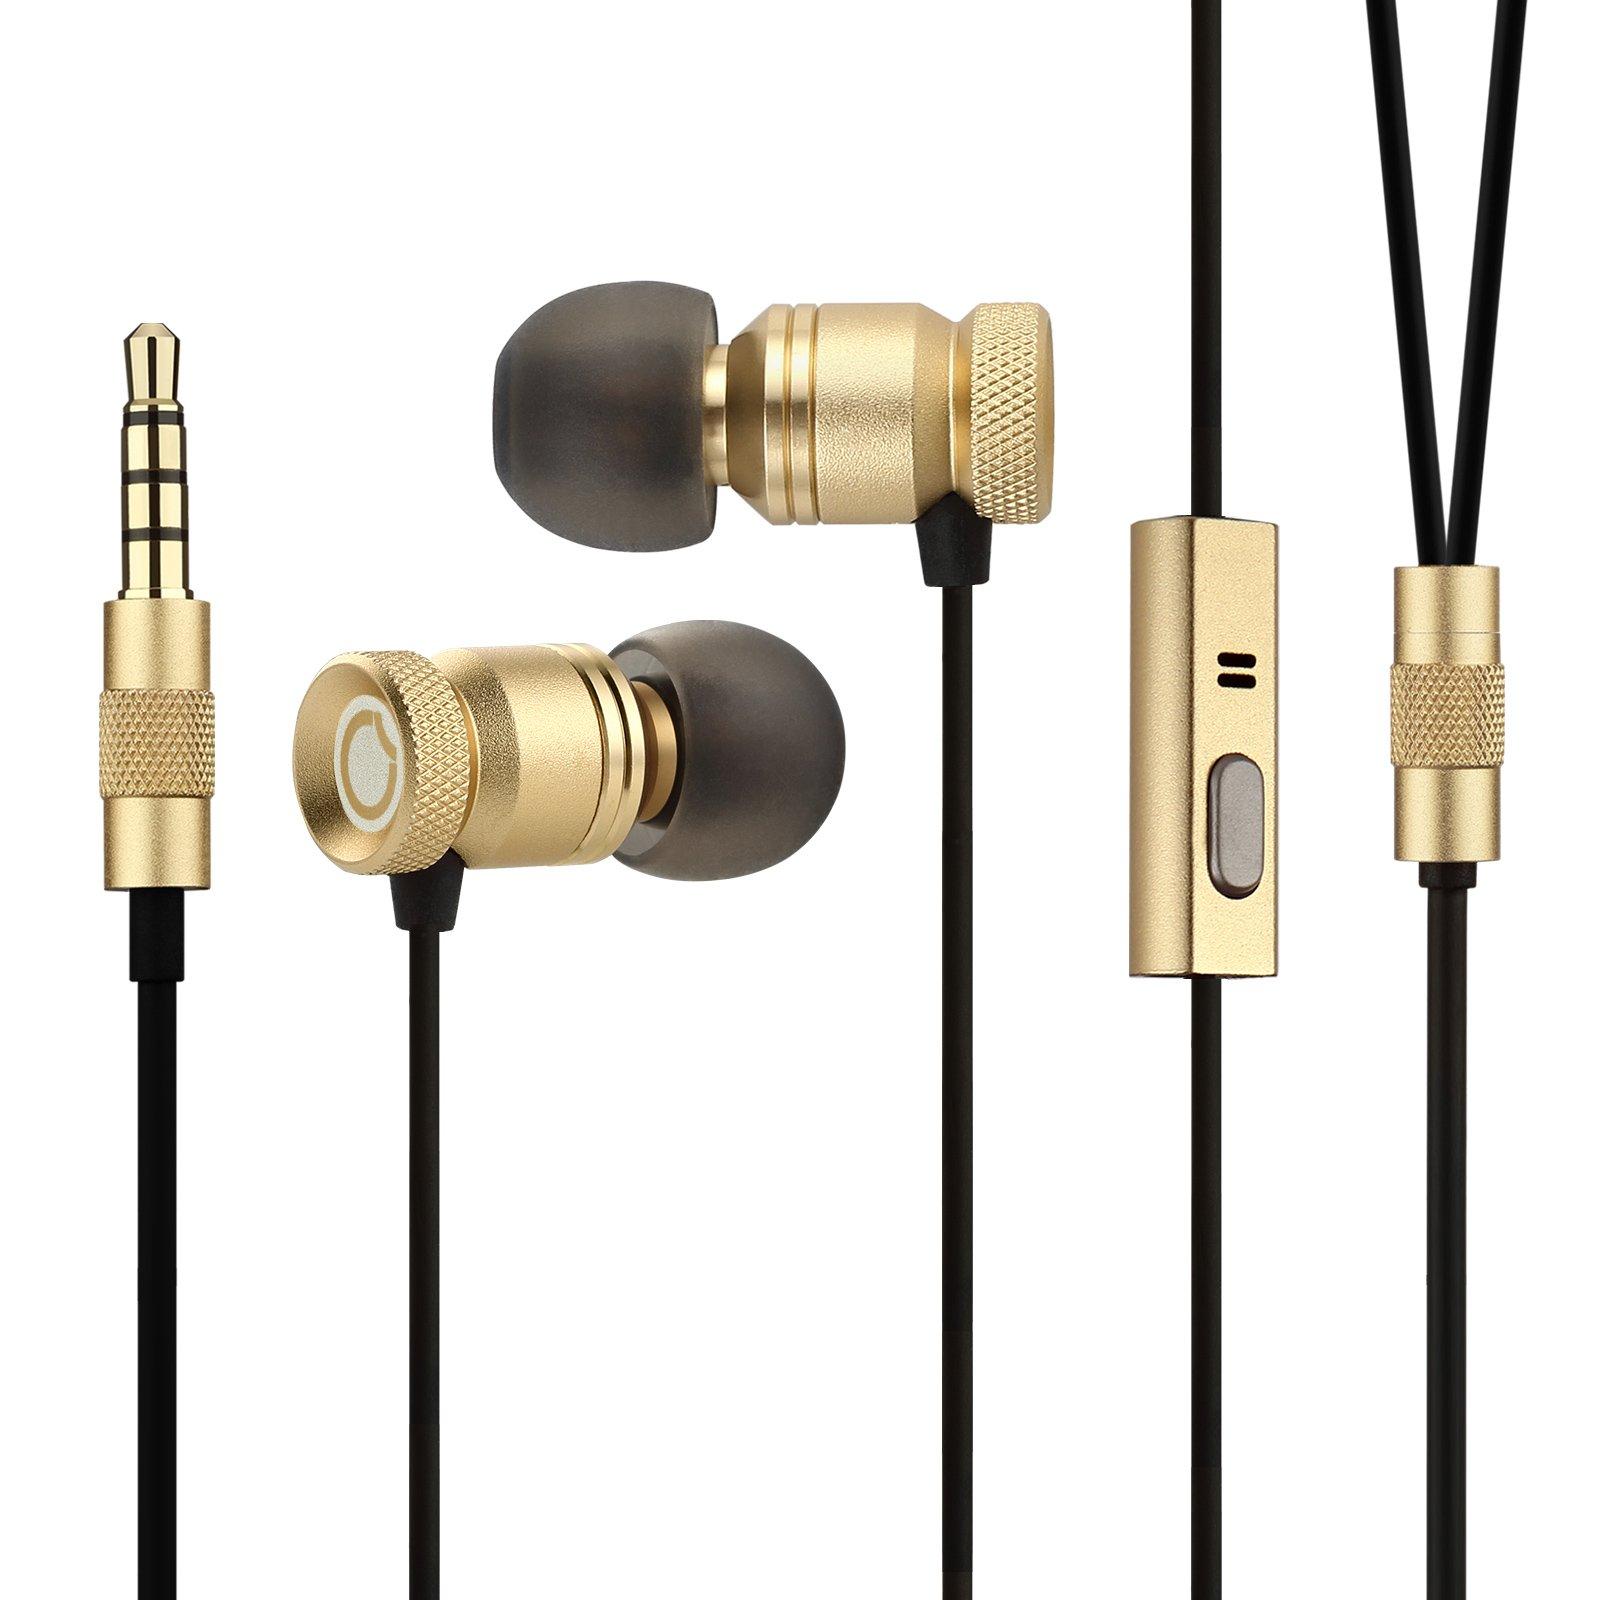 GGMM Nightingale Noise Isolating Headphone Microphone